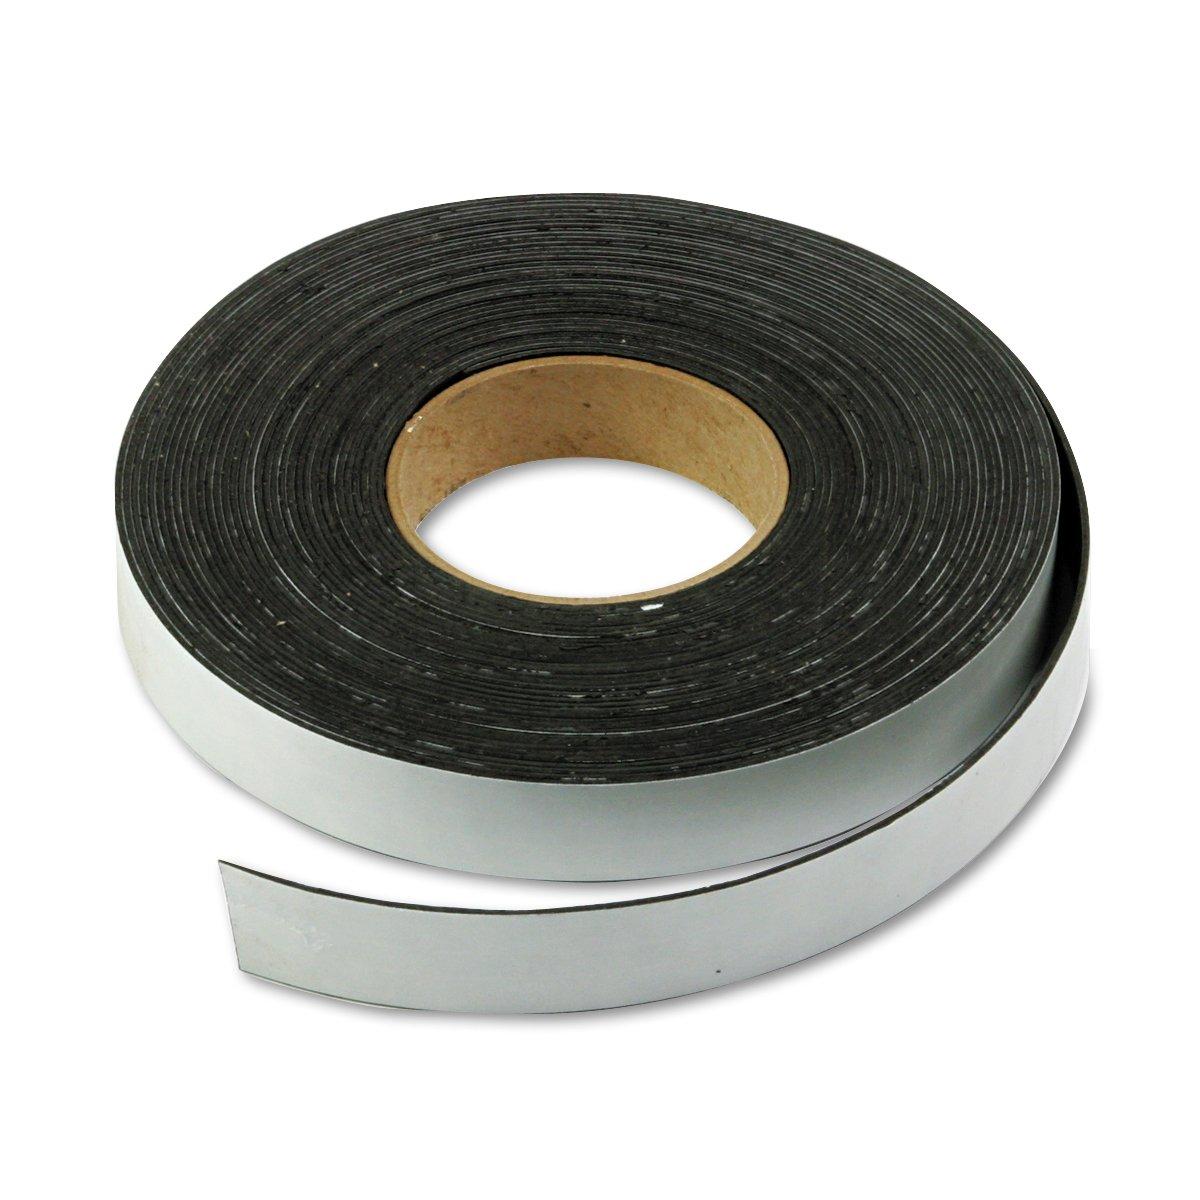 Magna Visual Magnetic Tape, 1-Inch X 50 Feet, Charcoal (MAVP240P)